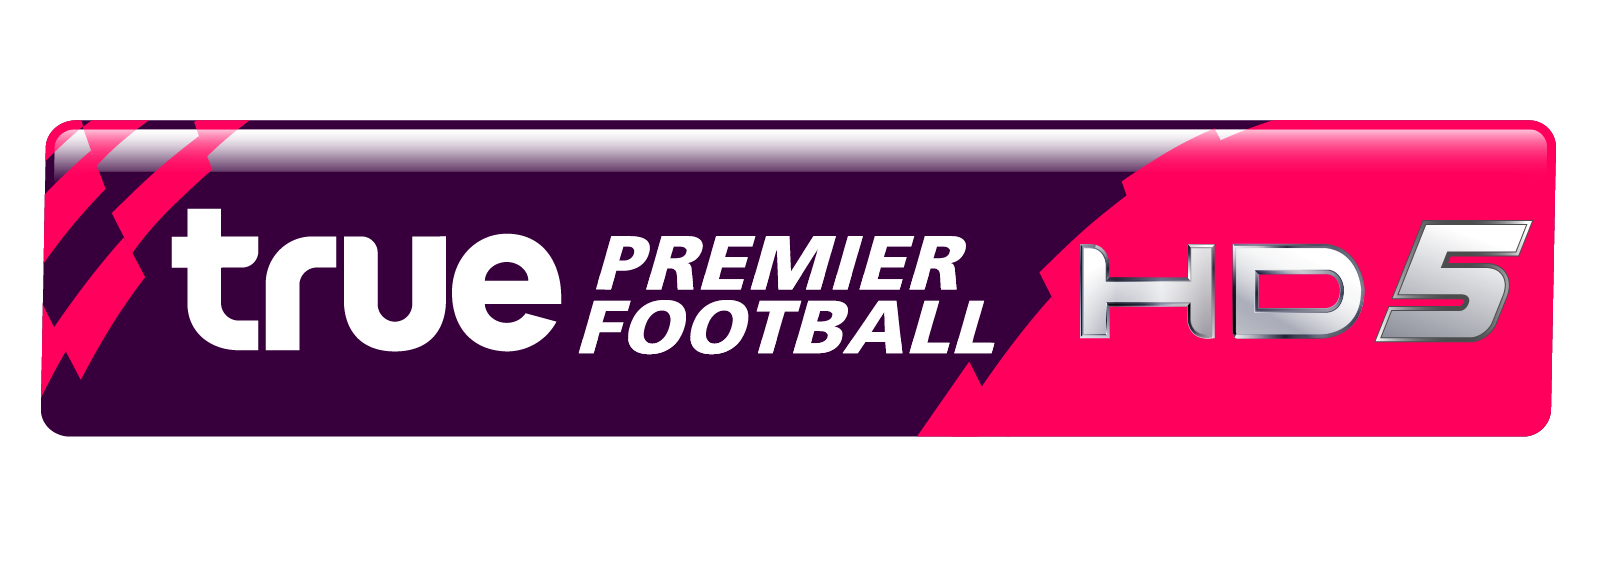 True Premier Football HD 5